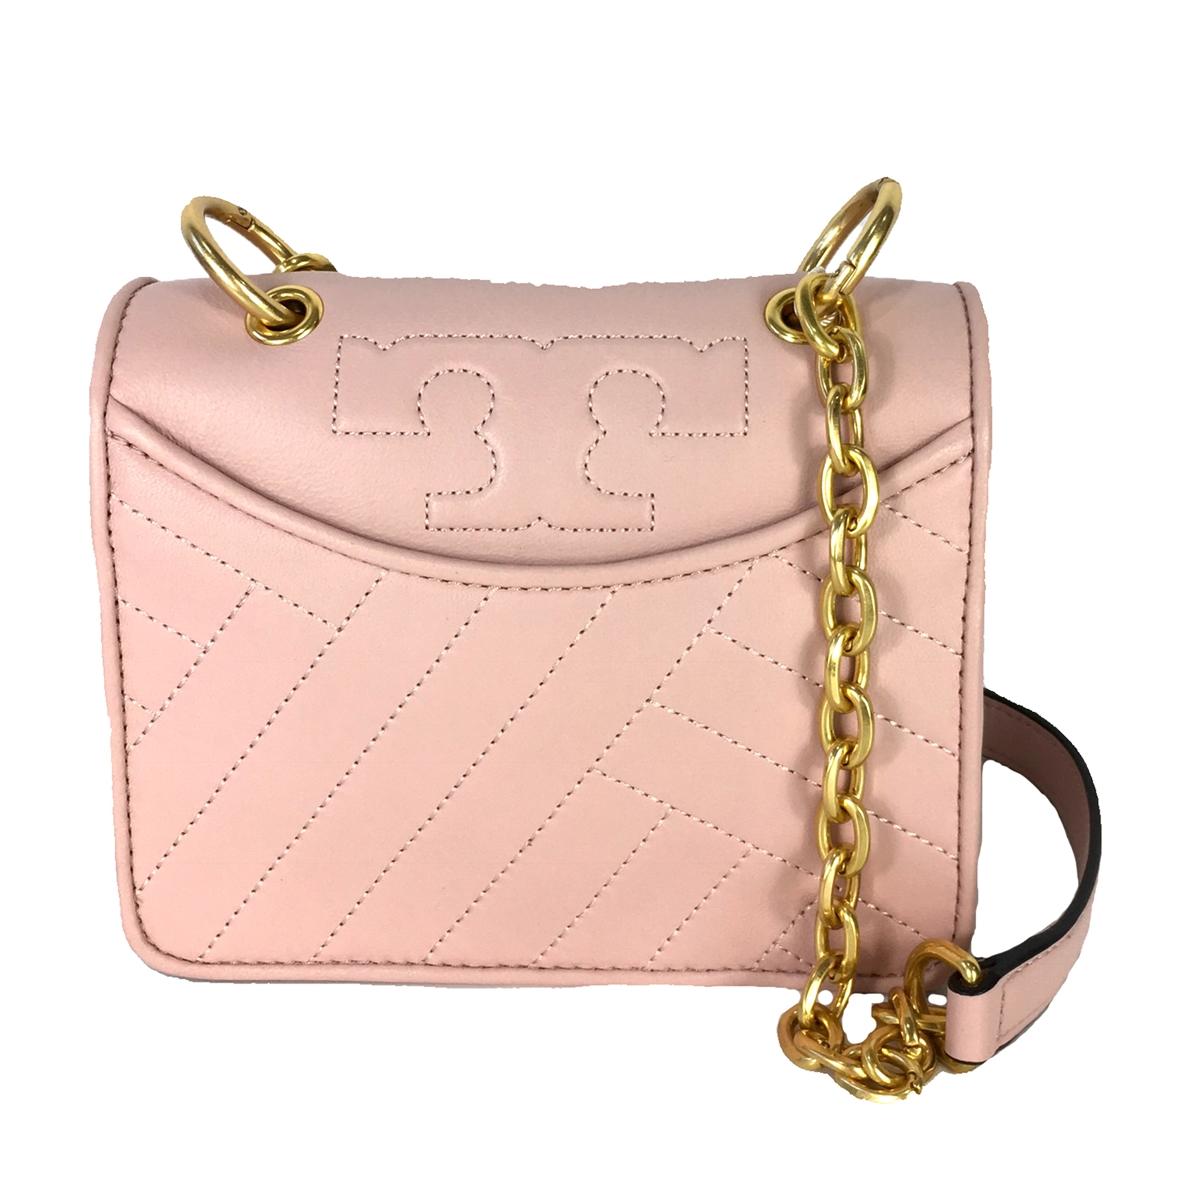 1d7ed6c5db53 Tory Burch Alexa Quilted Chain Mini Shoulder Bag